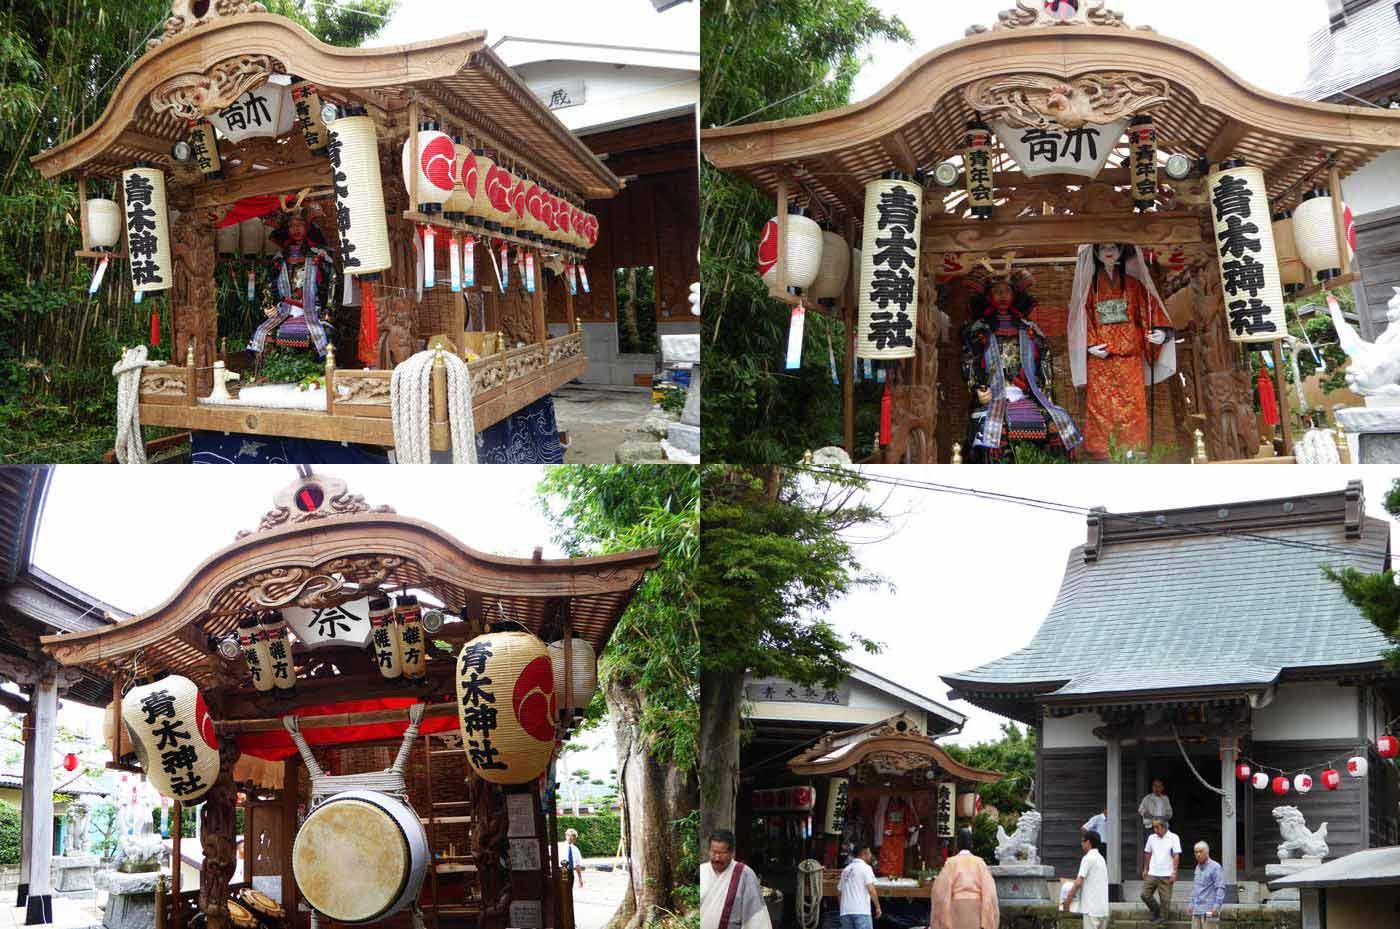 青木区 青木神社の屋台